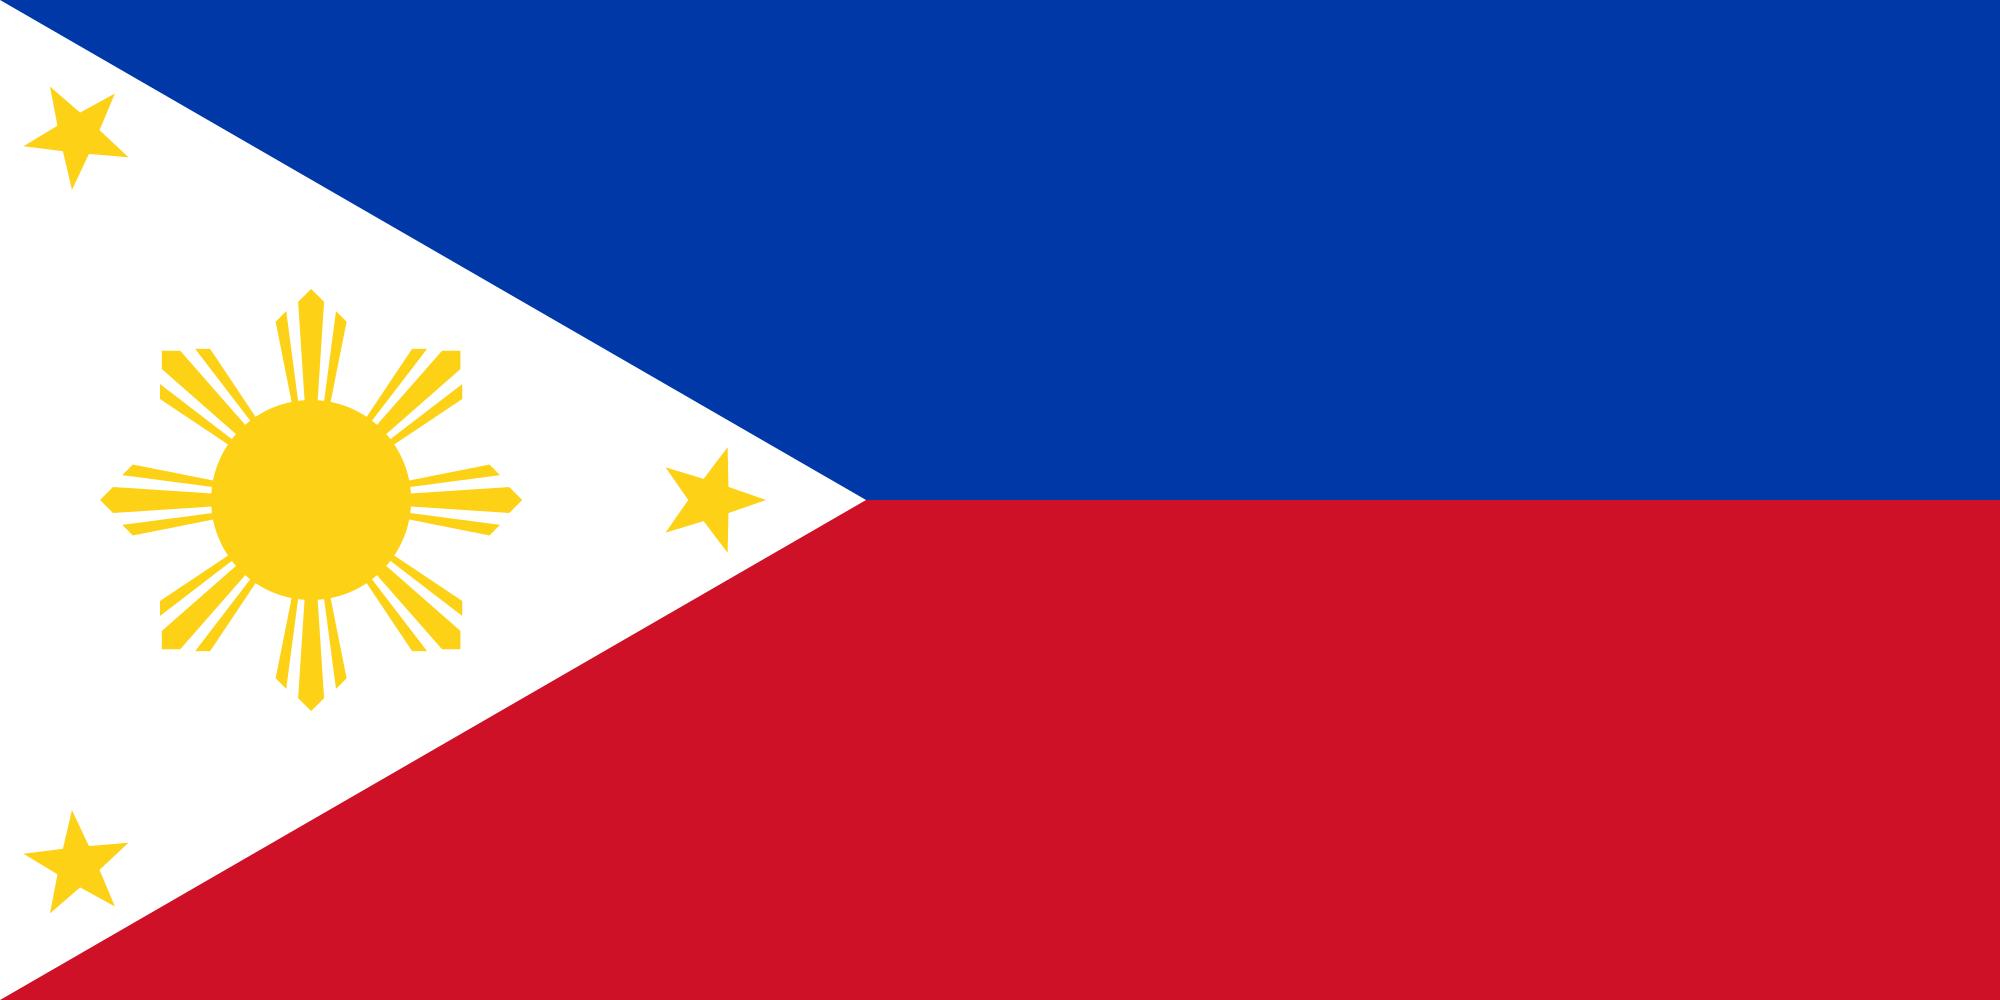 Native Speaker Tagalog - Filipino - Flagge